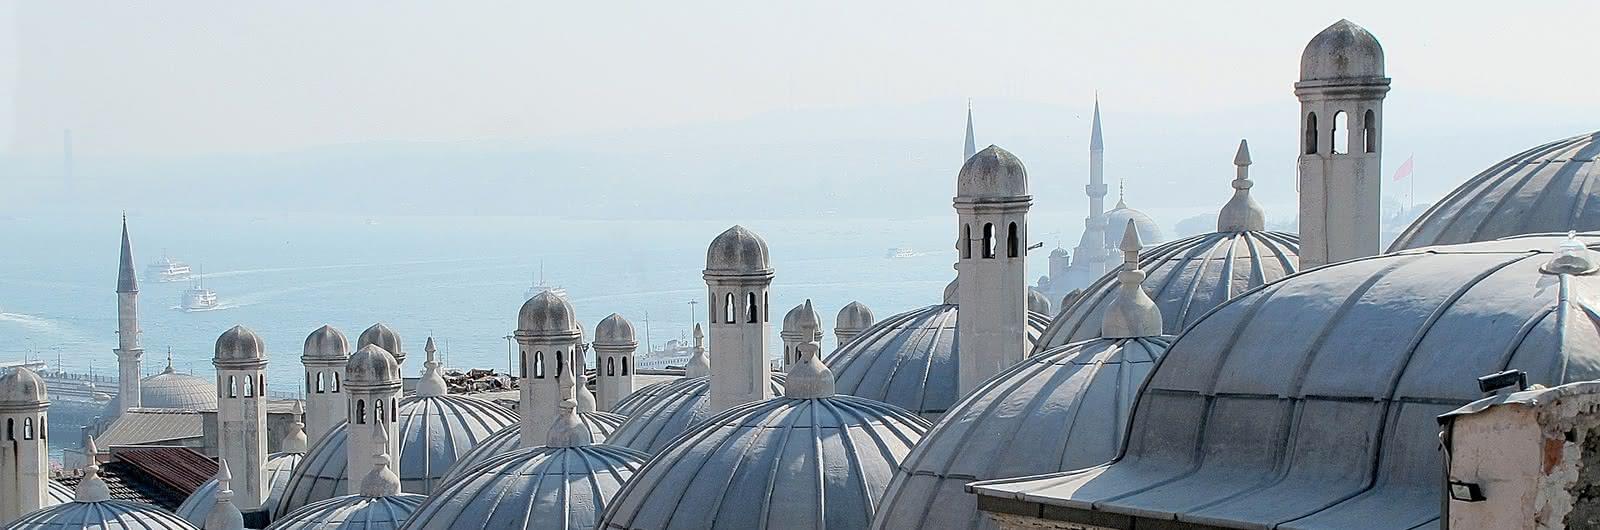 istanbul city header